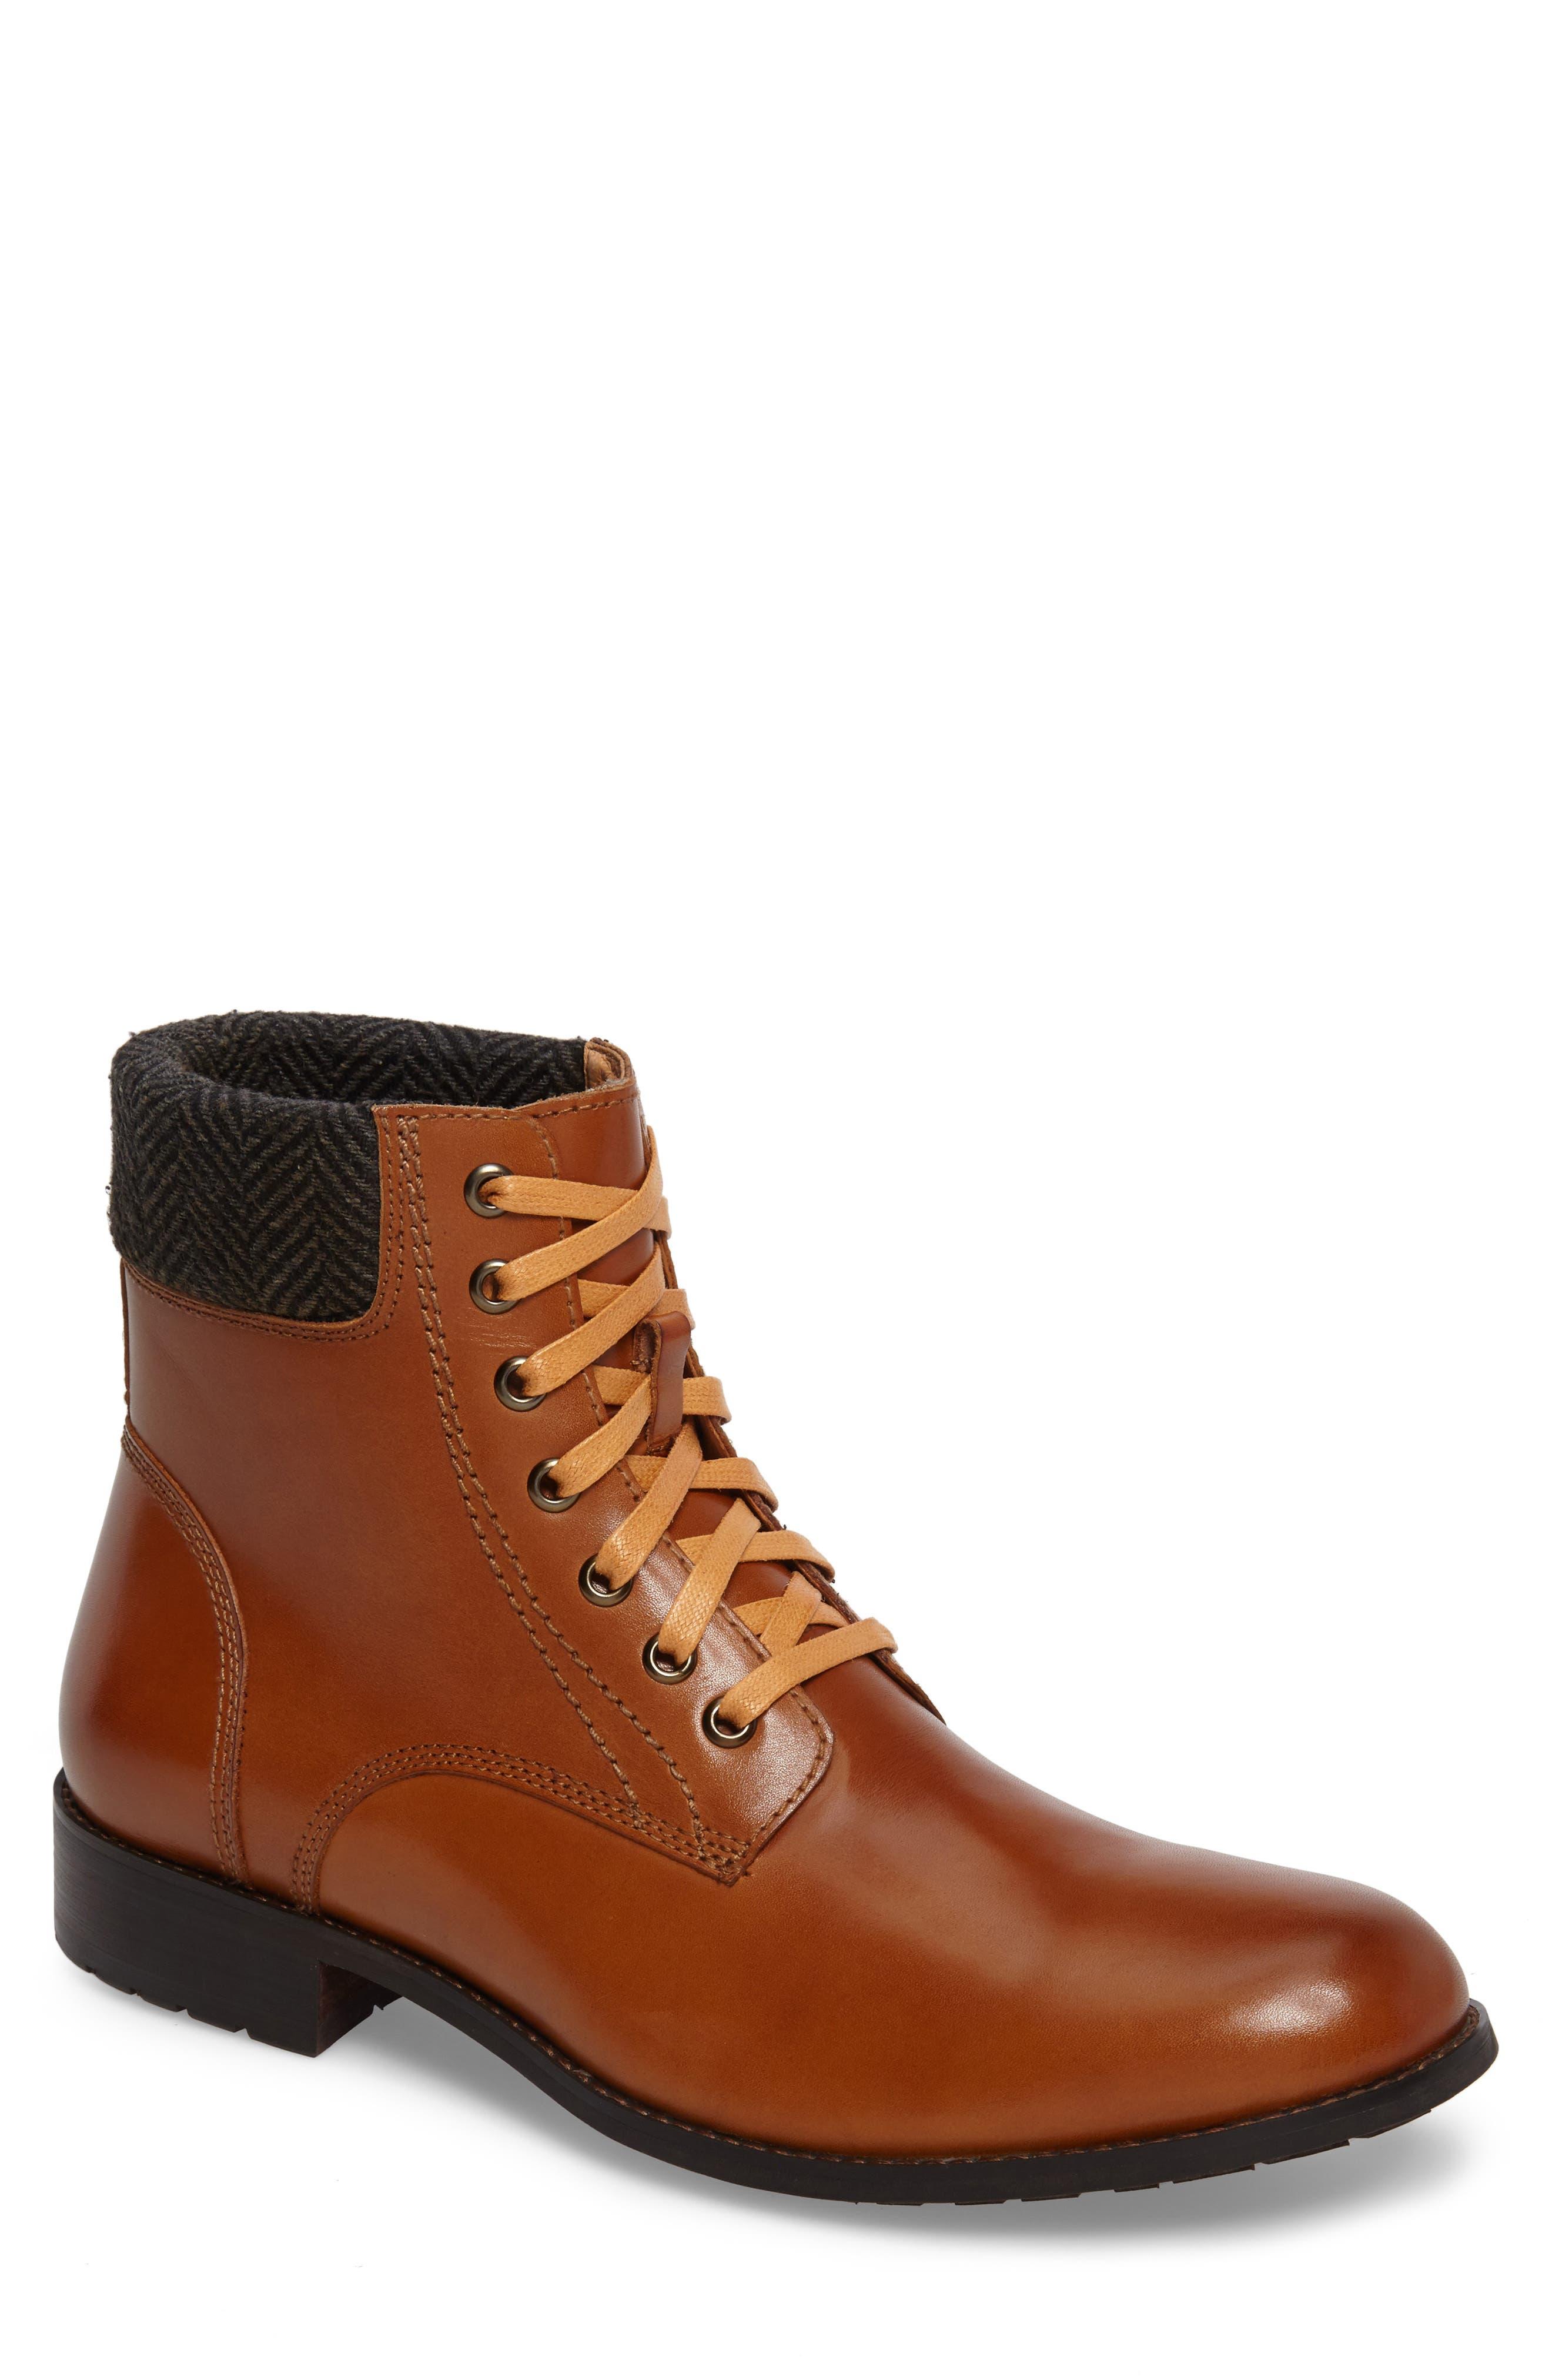 Saar Plain Toe Boot,                             Main thumbnail 3, color,